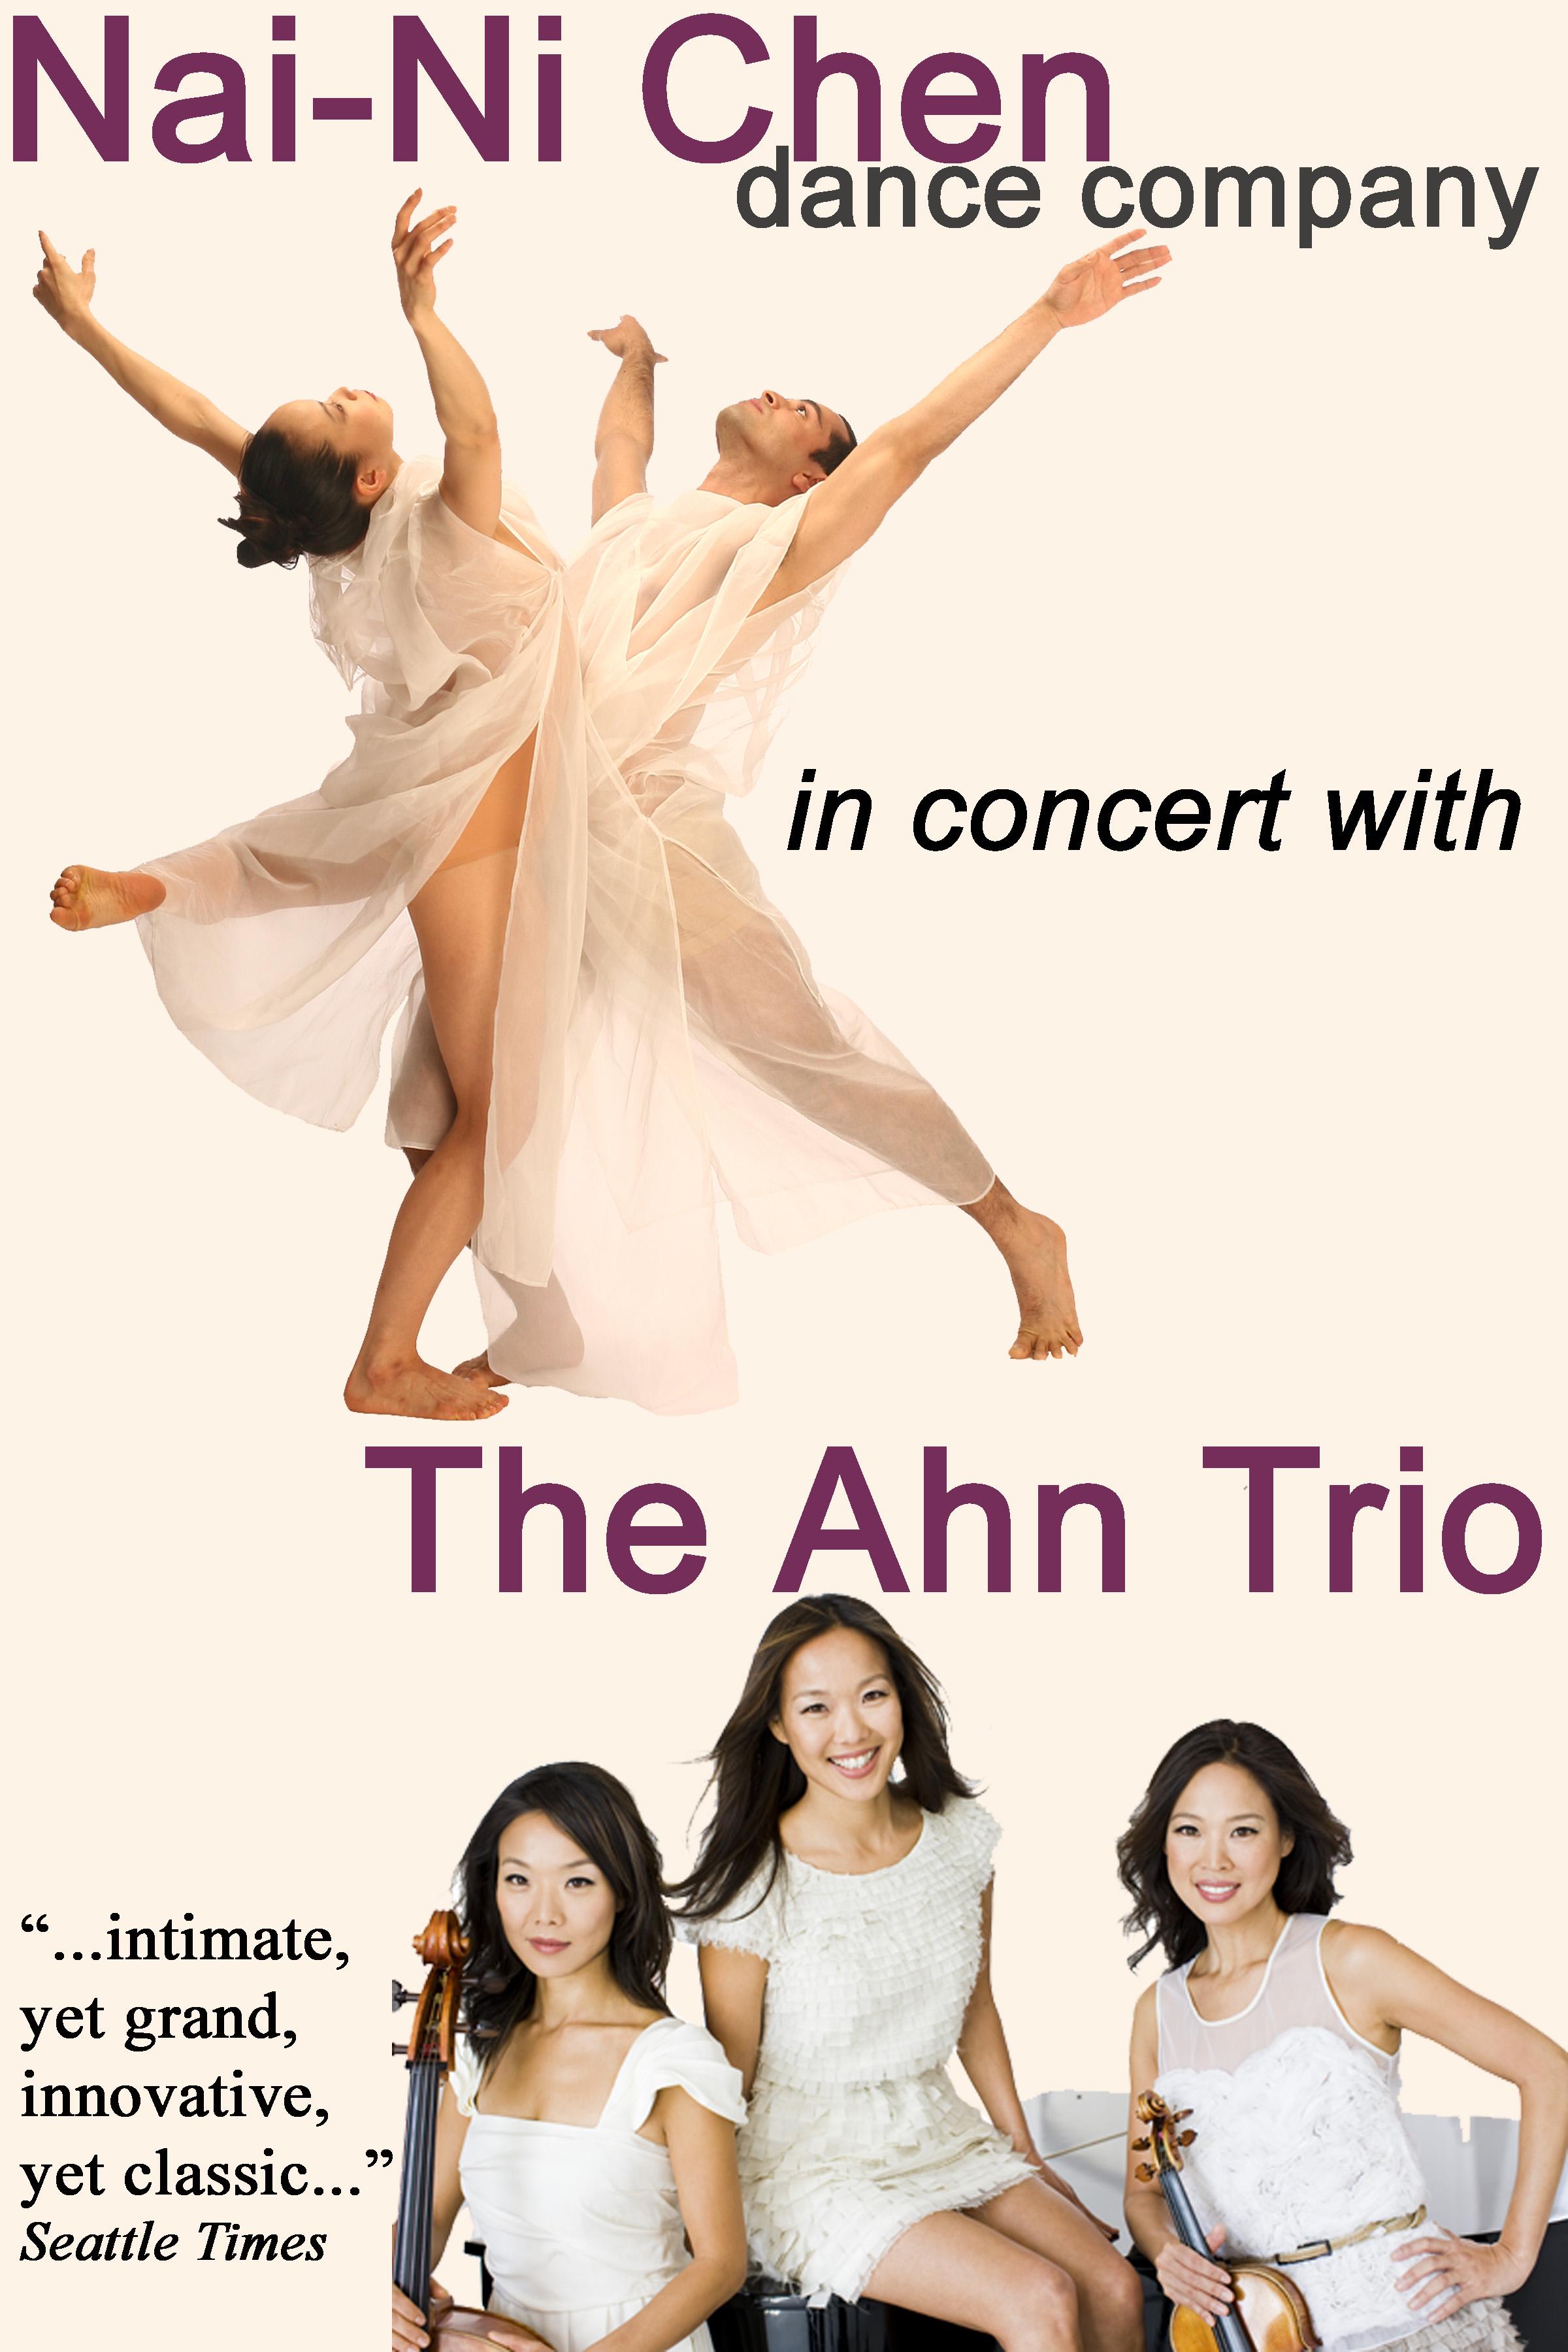 Image result for NAI-NI CHEN DANCE COMPANY AND THE AHN TRIO